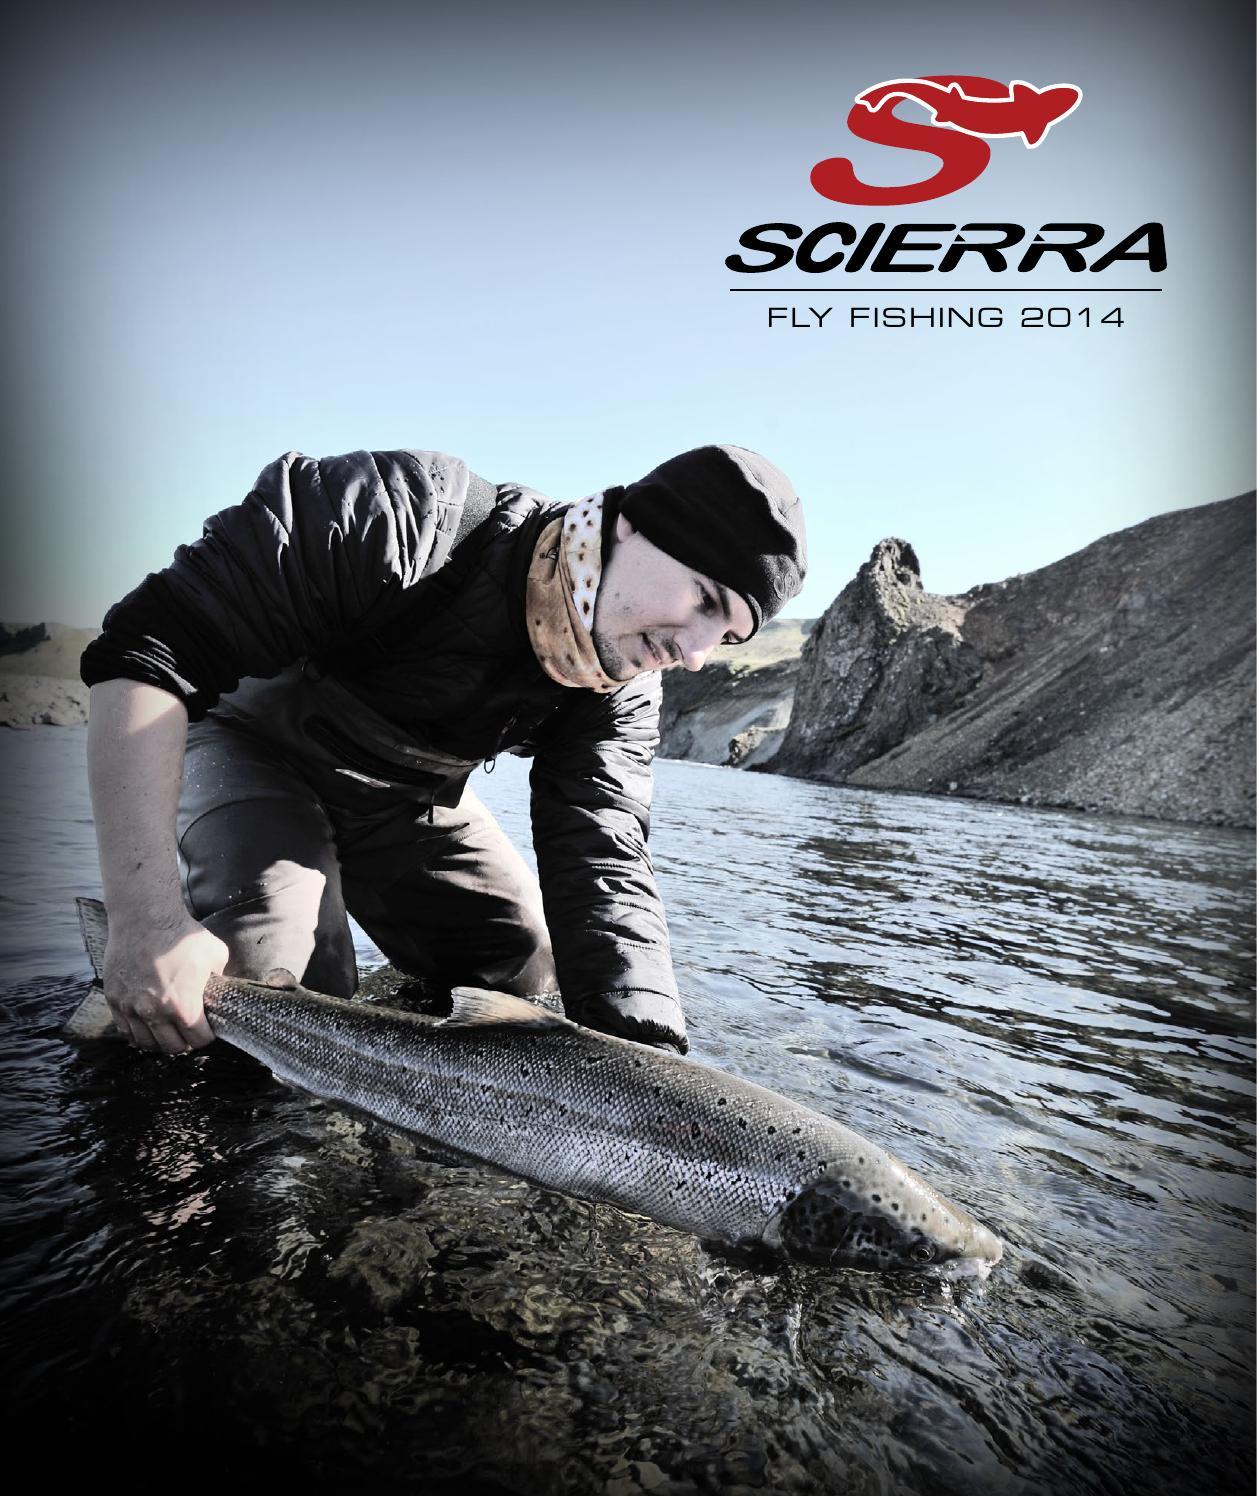 M XXL L XL SCIERRA PRO KENAI FISHING JACKET WATERPROOF FISHING COAT SIZE S